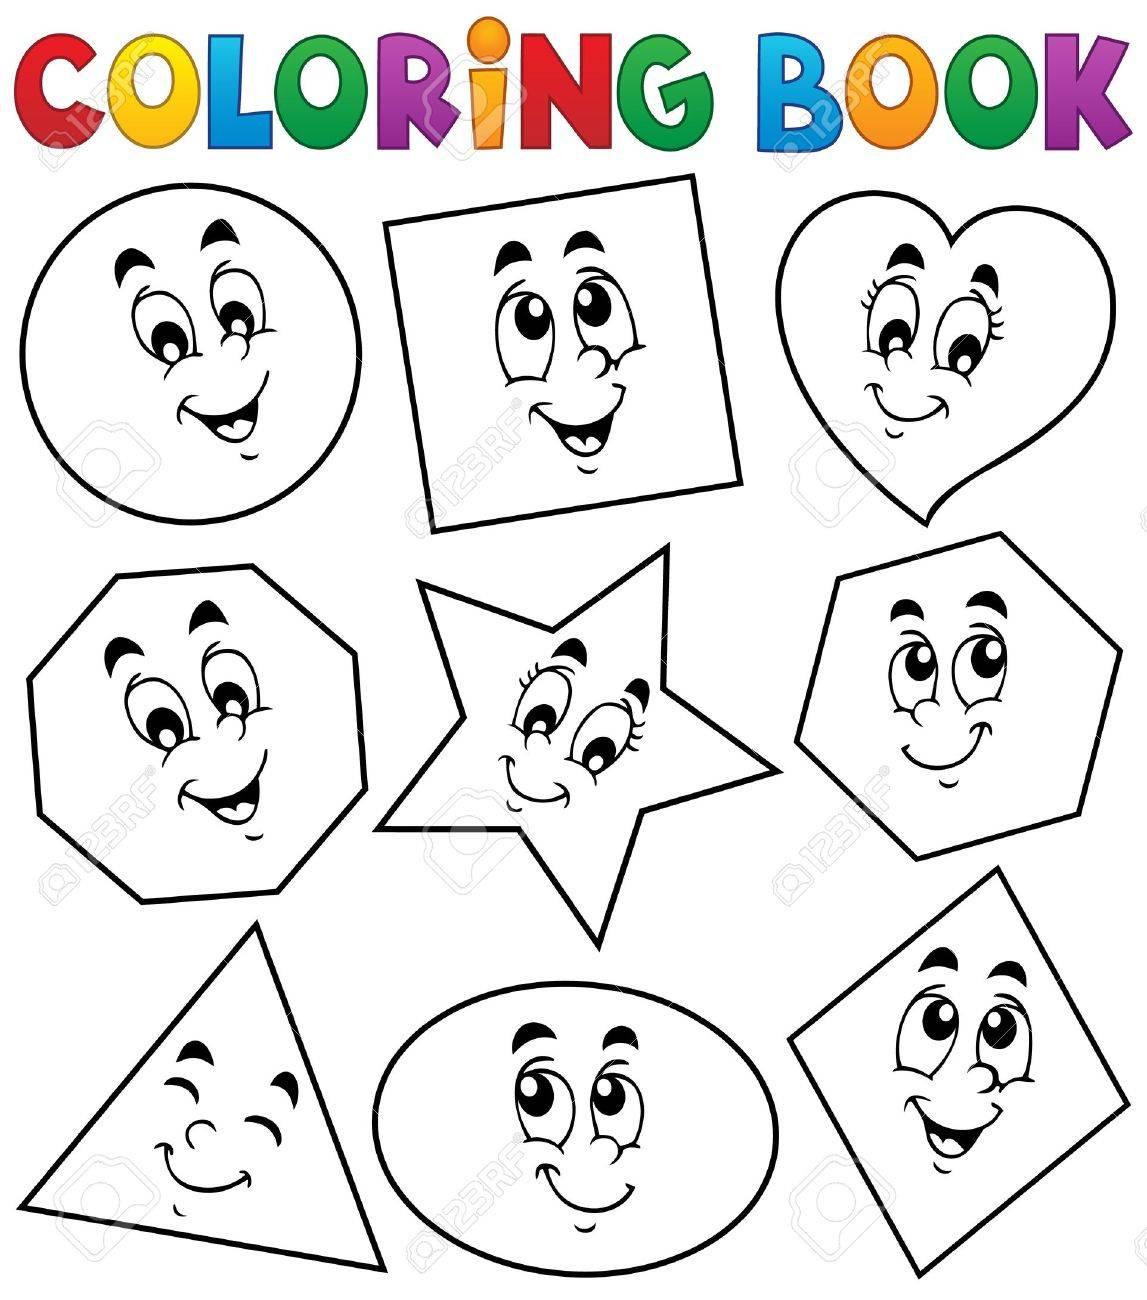 Coloring Book Various Shapes Royalty Free Cliparts, Vectors, And ...